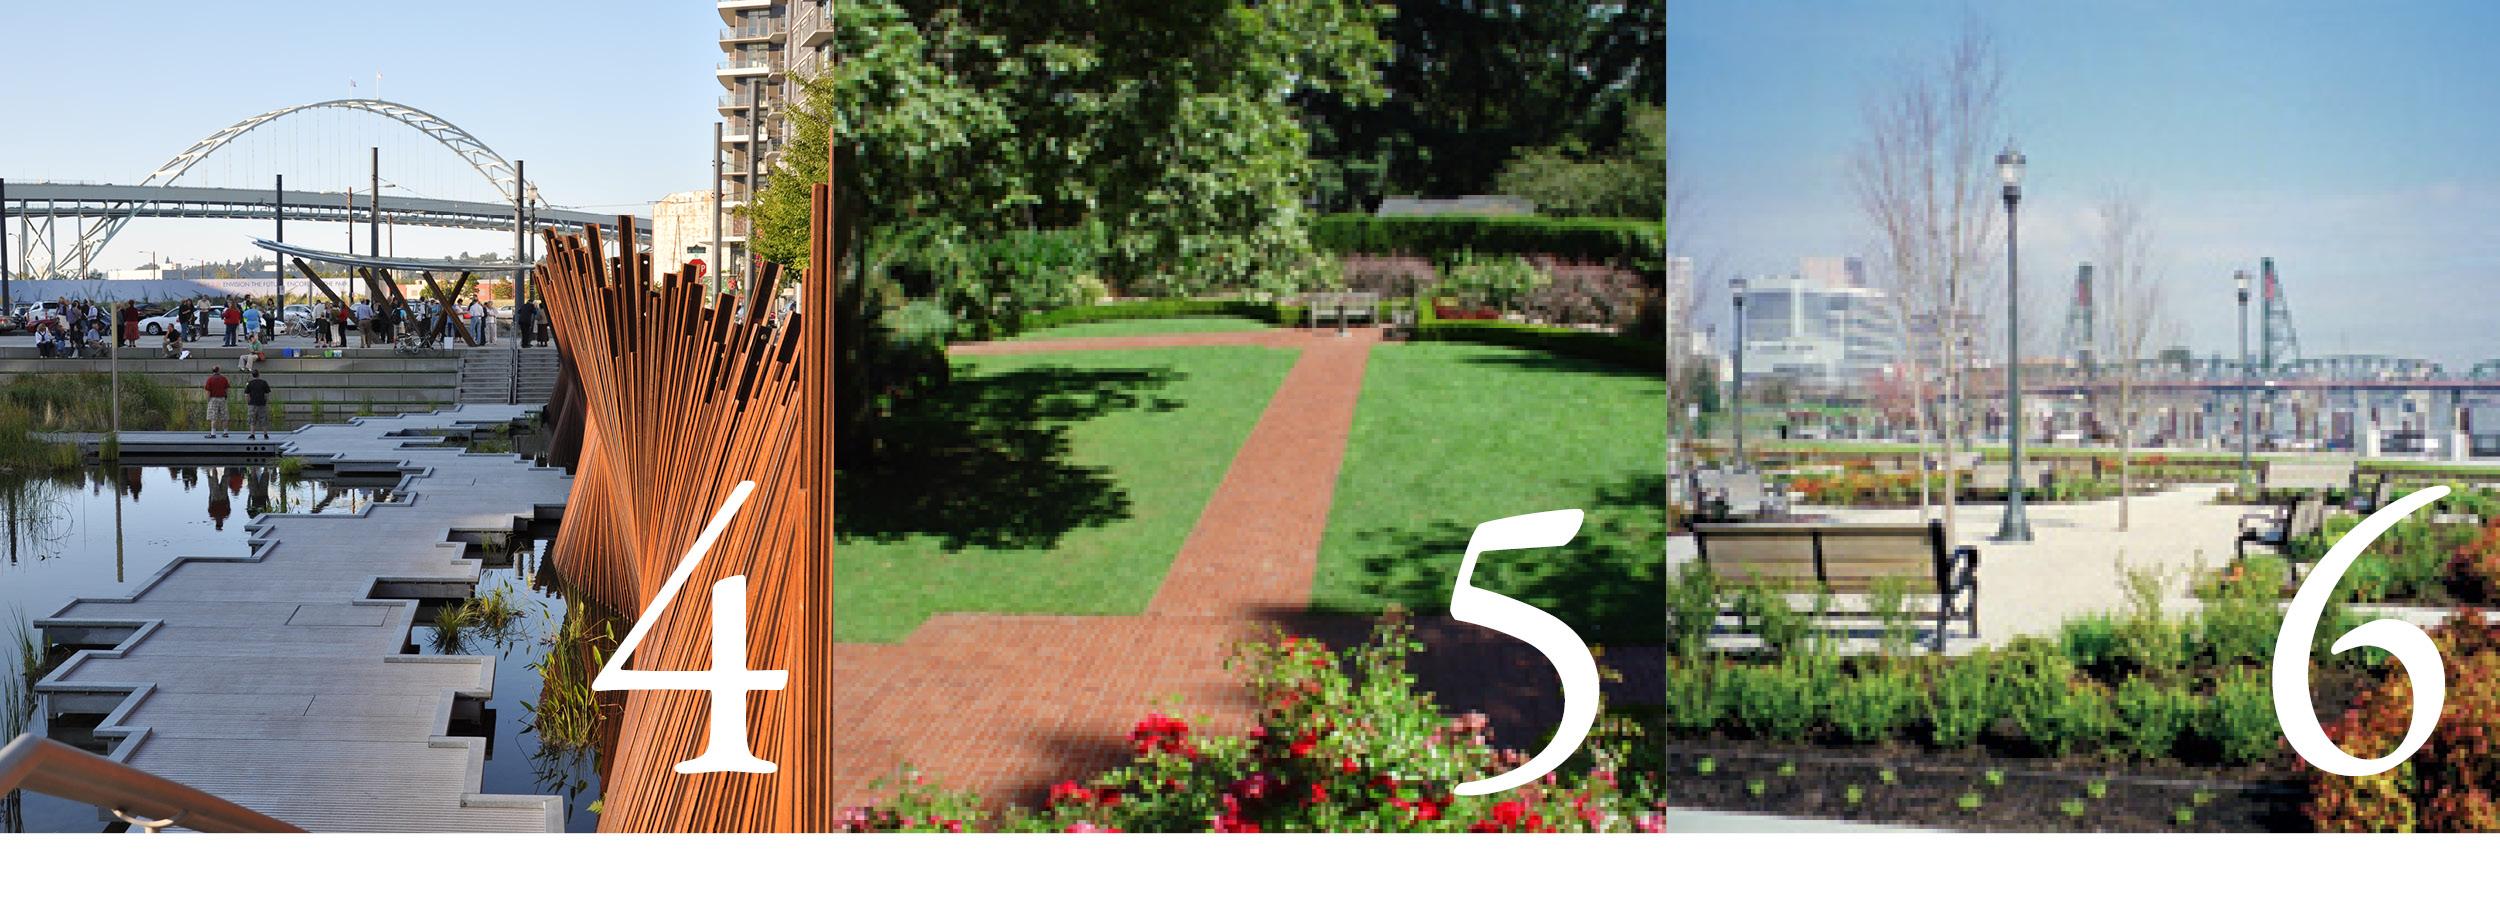 Photos 5 and 6 courtesy Portland Parks & Recreation